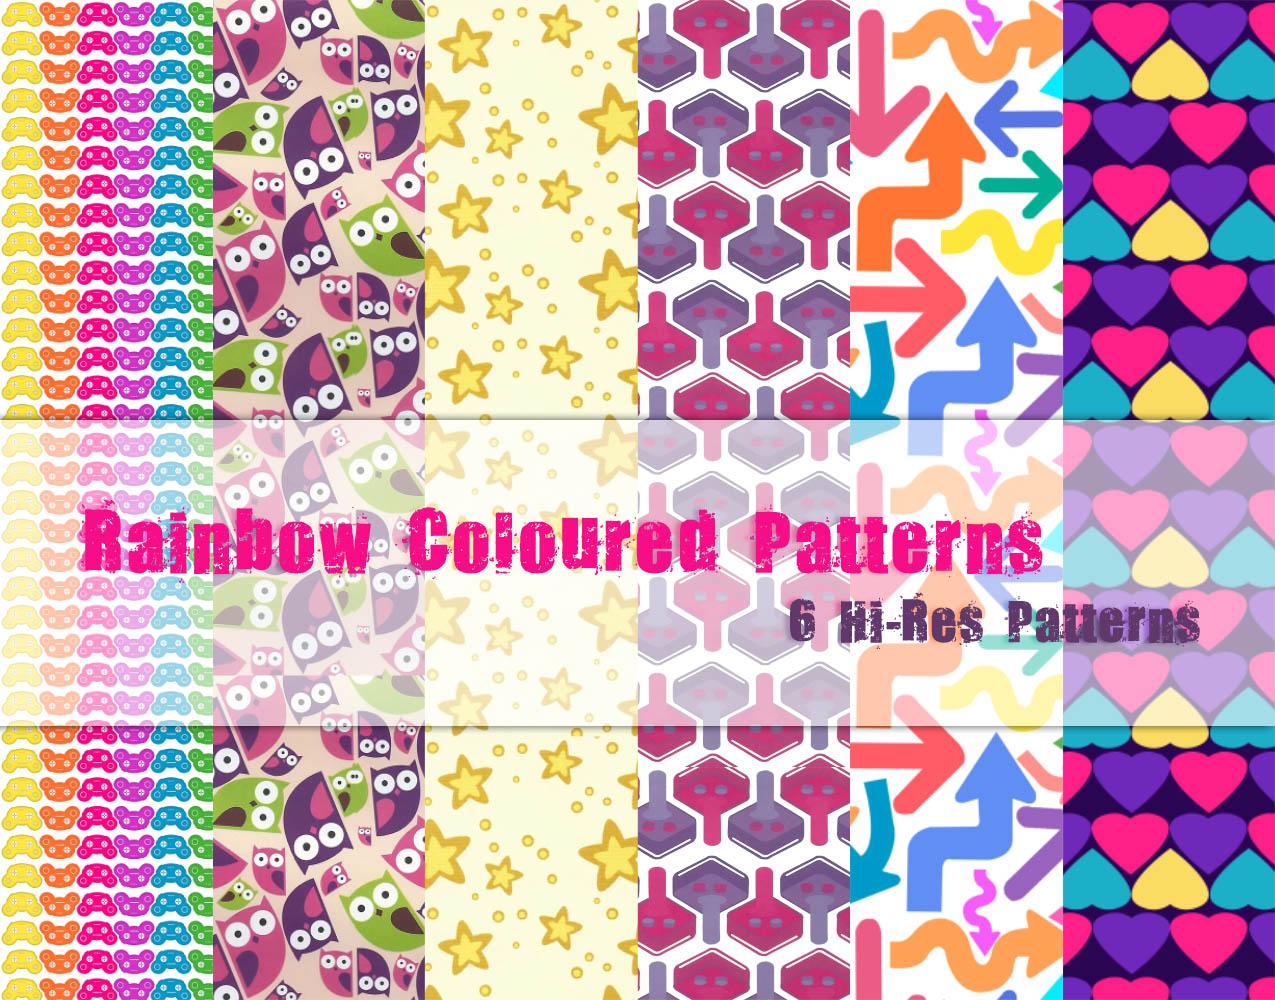 Rainbow Coloured Patterns